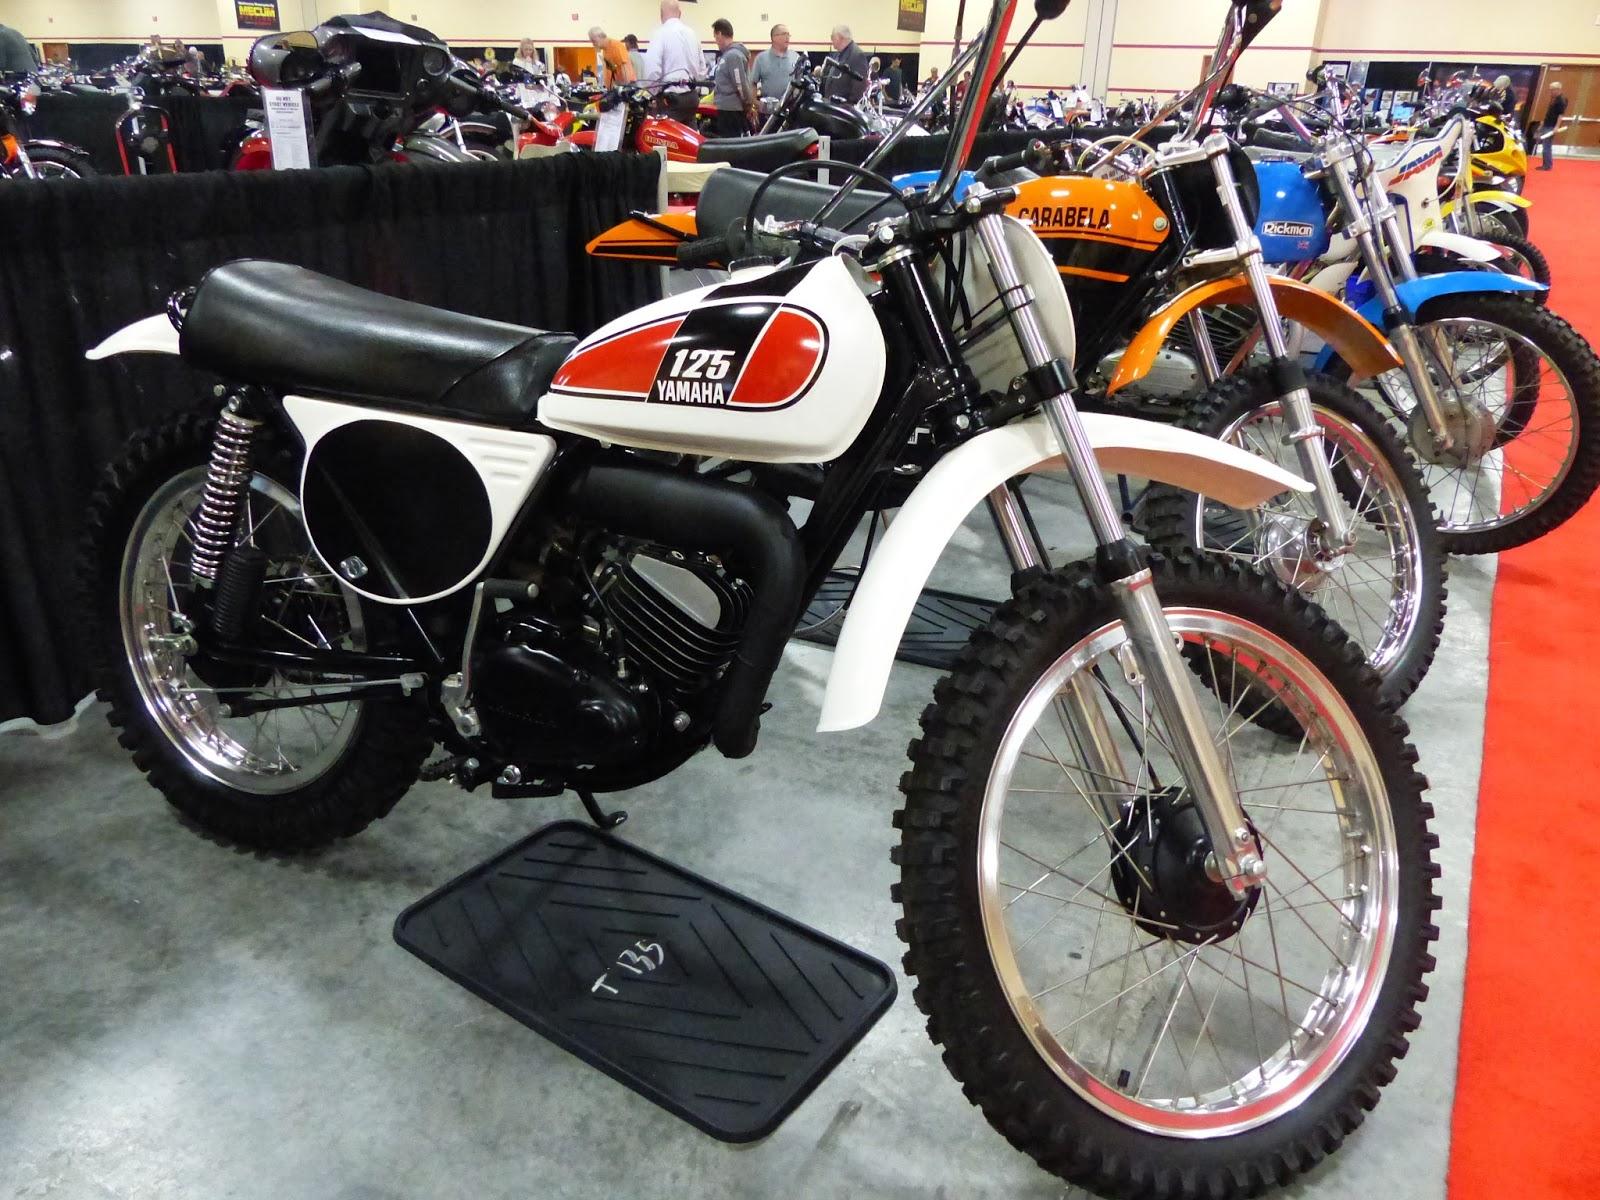 Yamaha Motorcycles Of Las Vegas